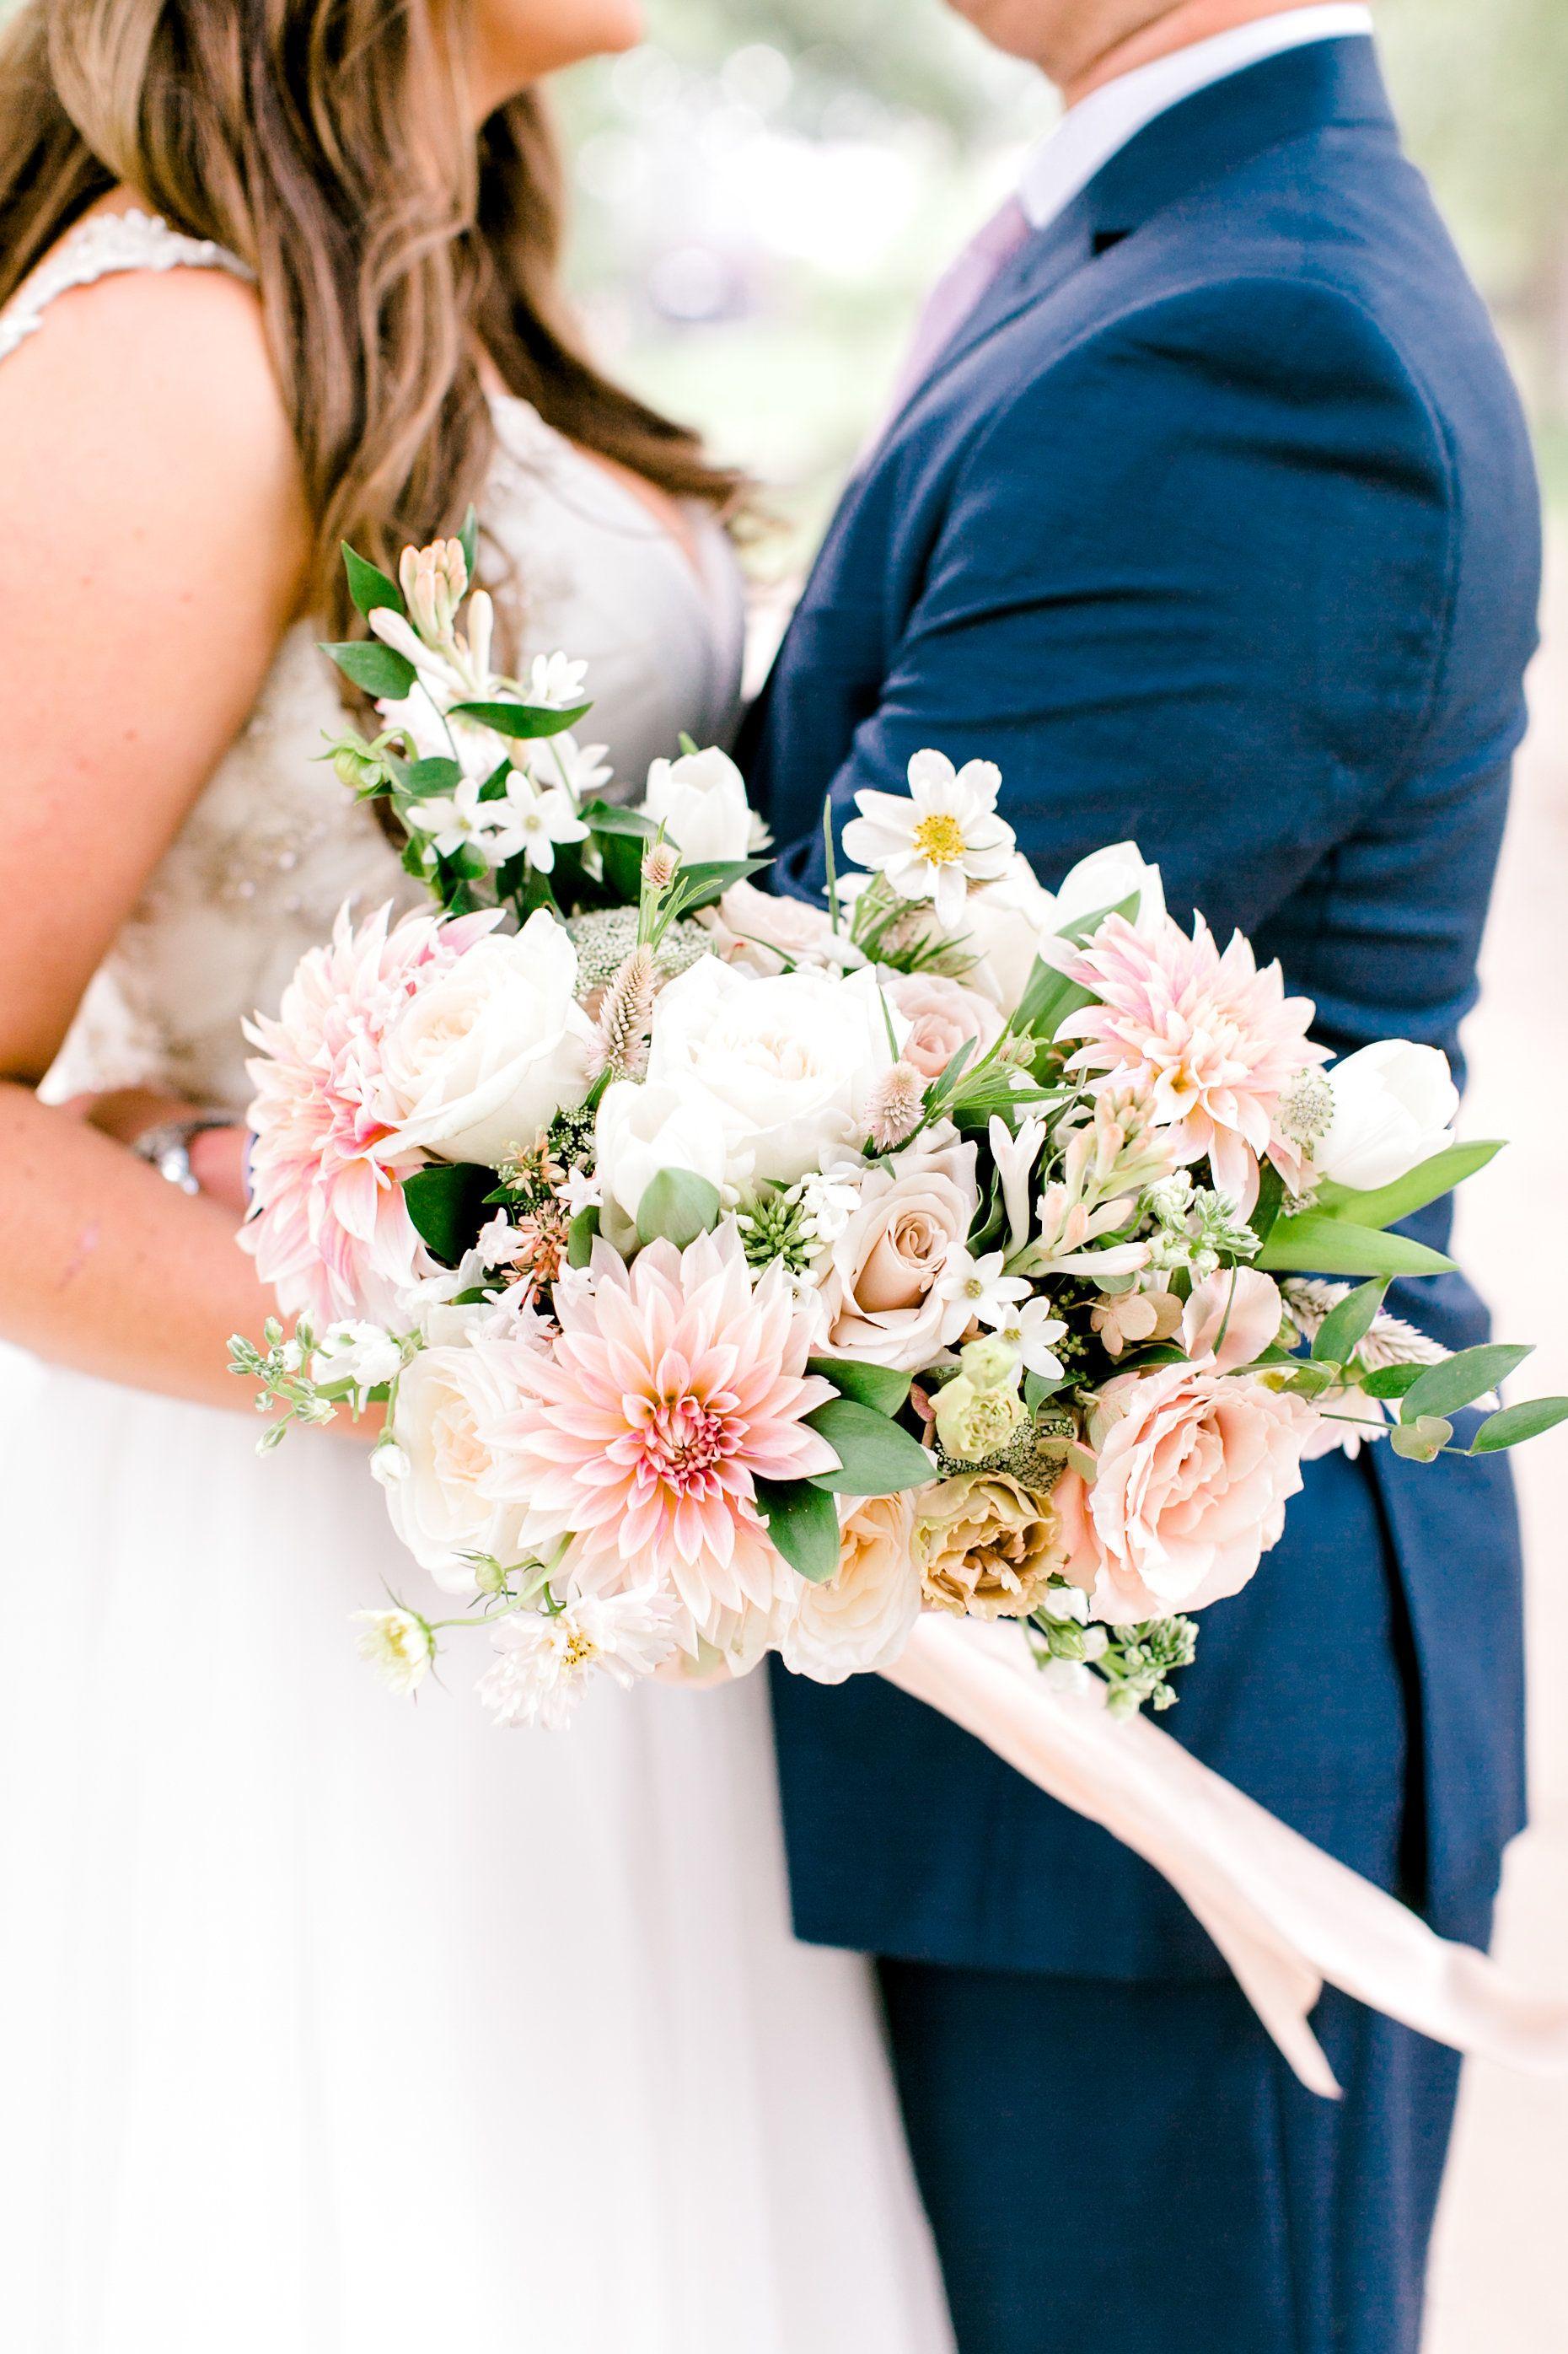 Choosing Wedding Flowers By Season Wedding Forward Wedding Flower Guide Colorful Wedding Flowers Flower Guide